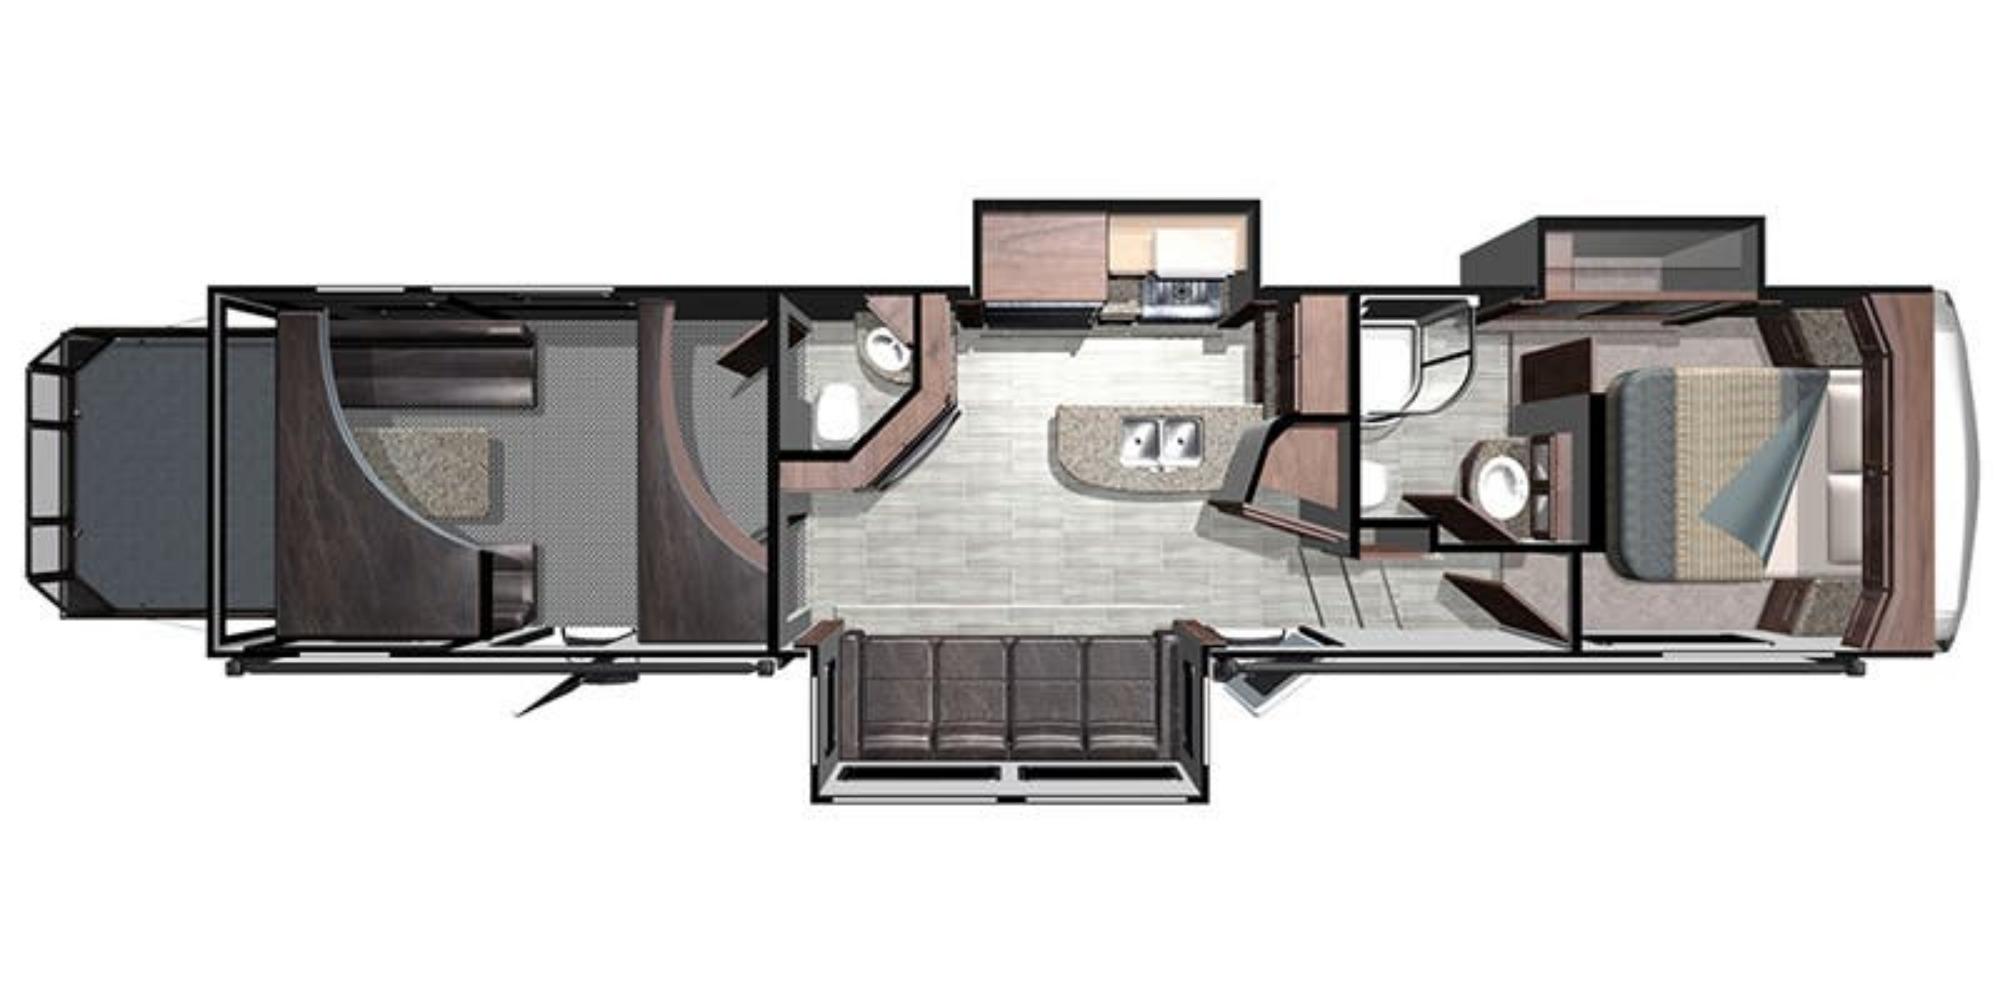 View Floor Plan for 2020 HIGHLAND RIDGE HIGHLANDER 350H